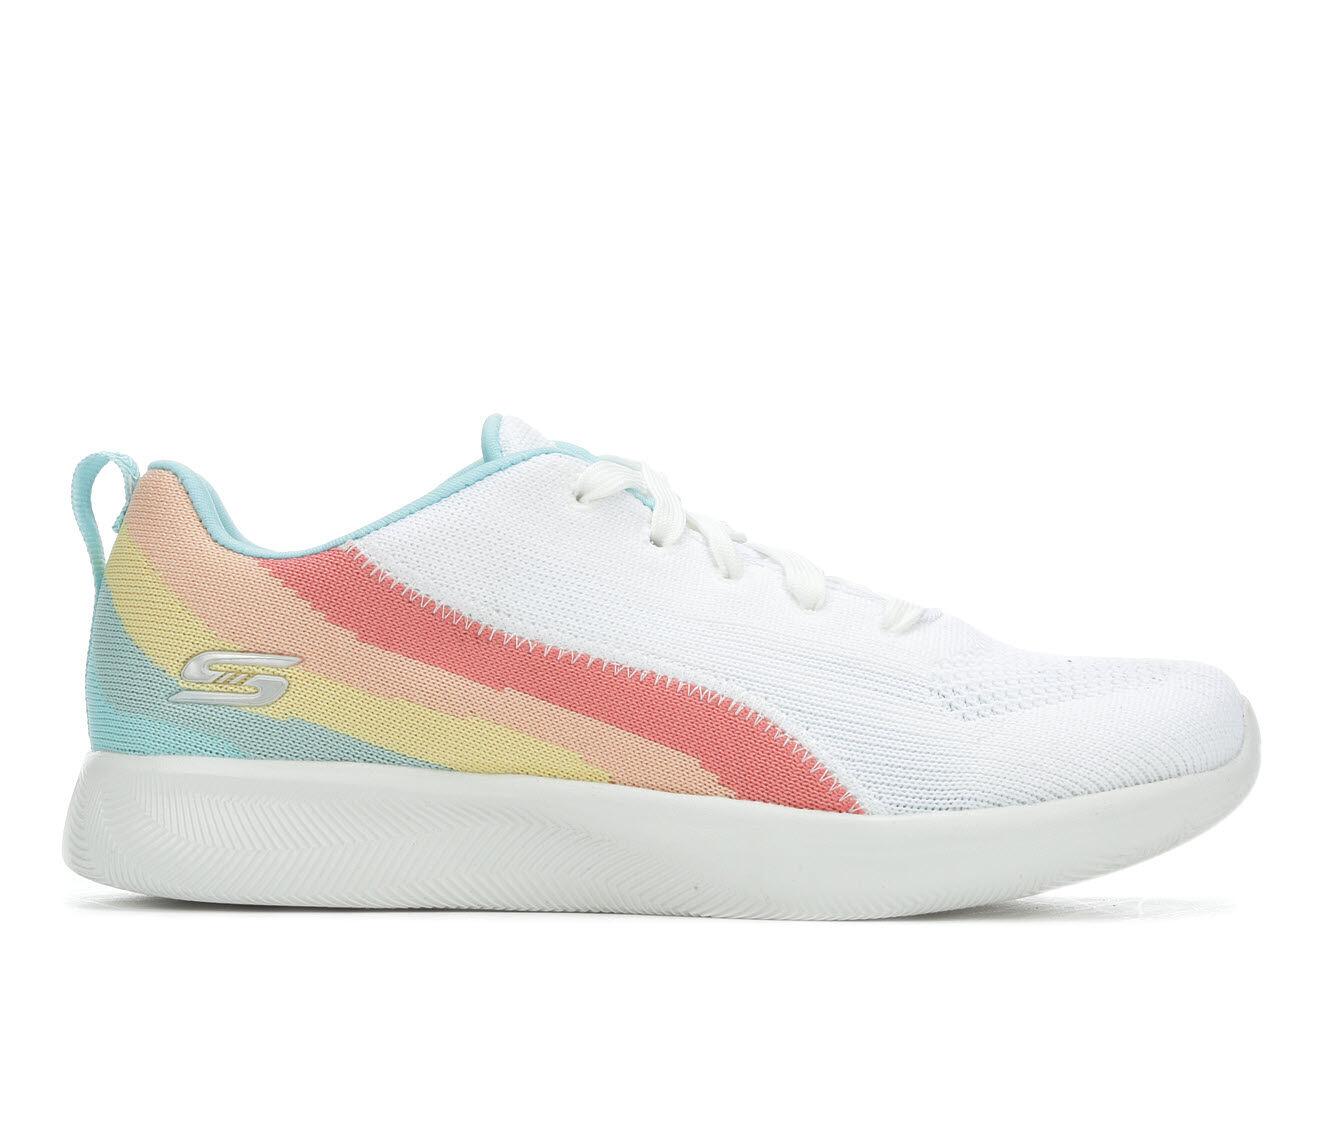 buy discount Women's Skechers BOBS Glamtastic 32809 Sneakers White/Multi